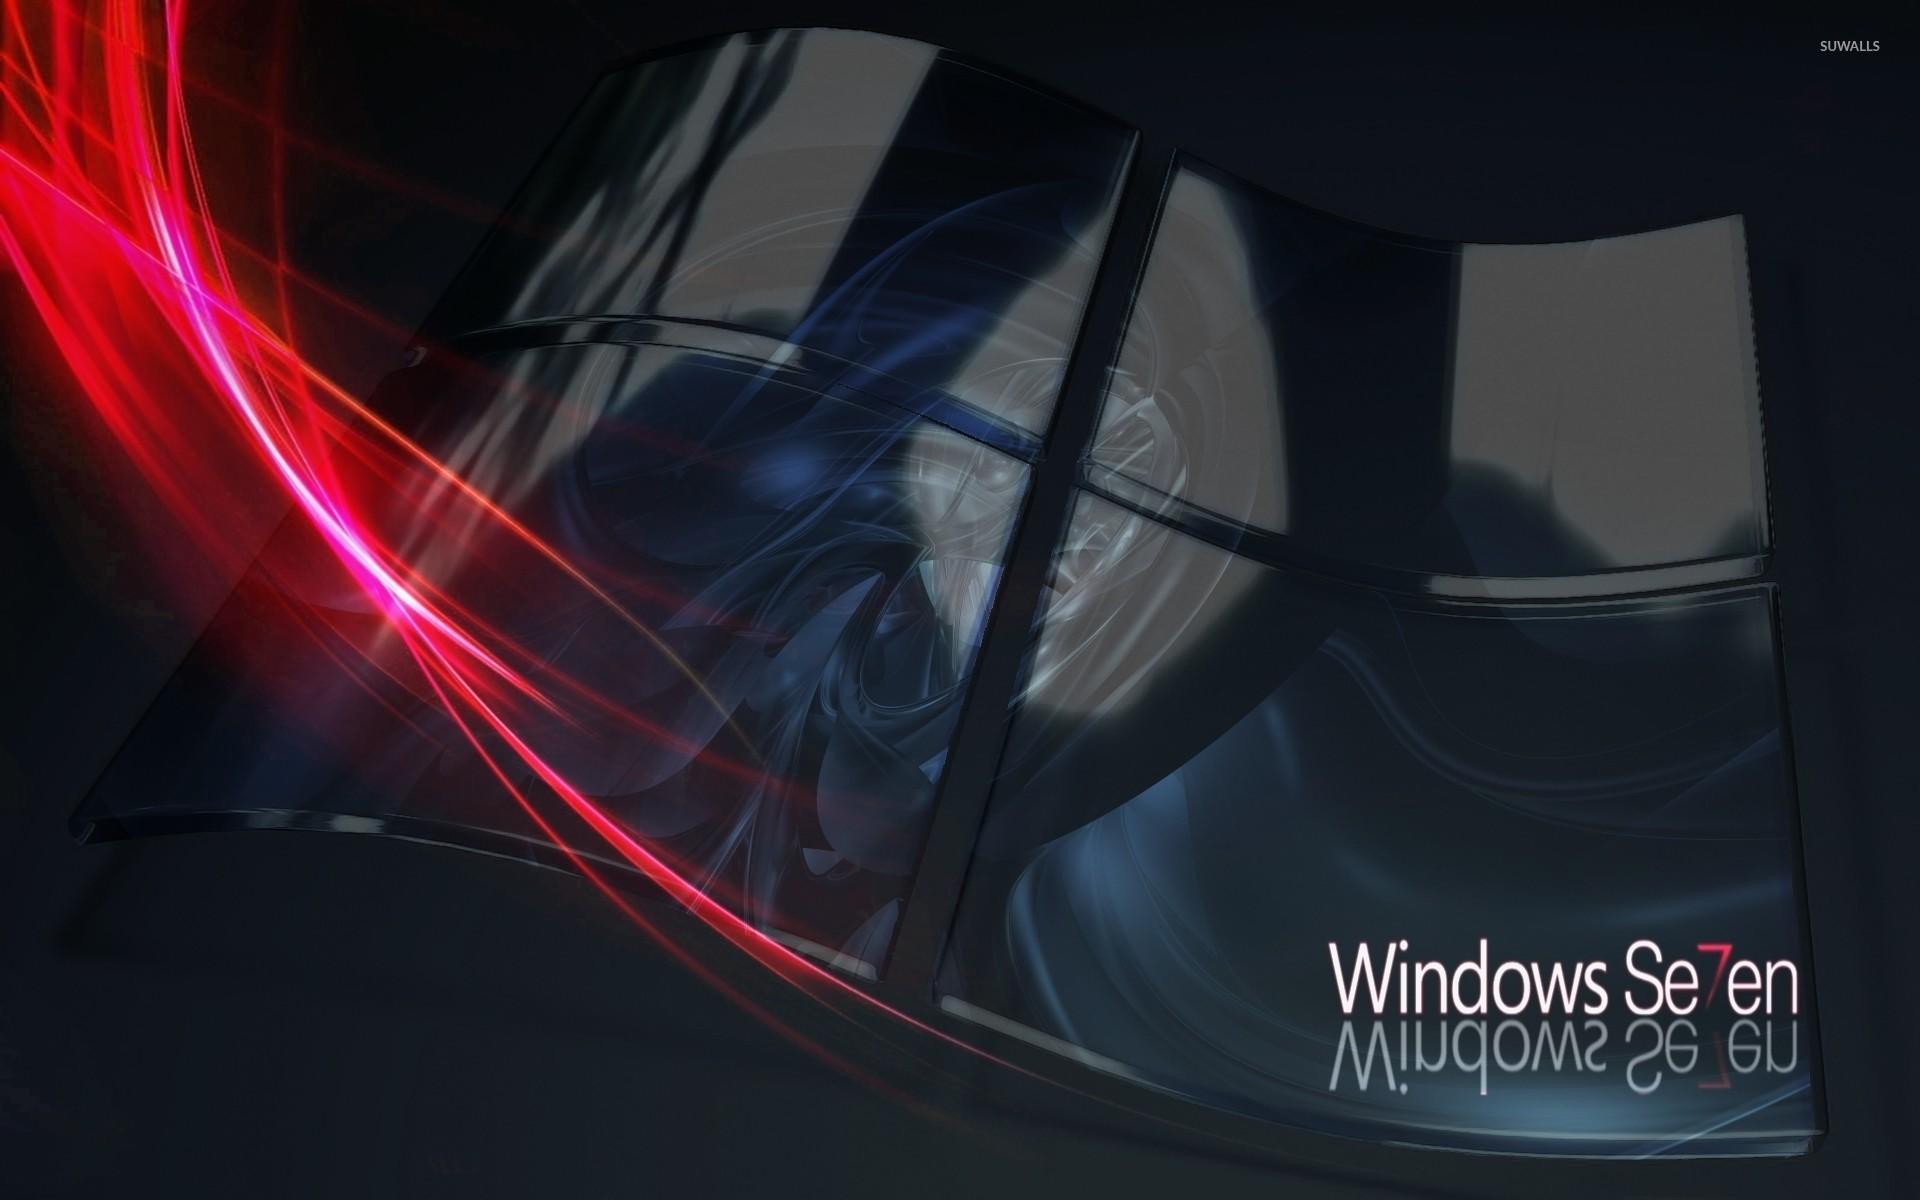 Windows 7 Wallpaper 1366x768 81 Pictures